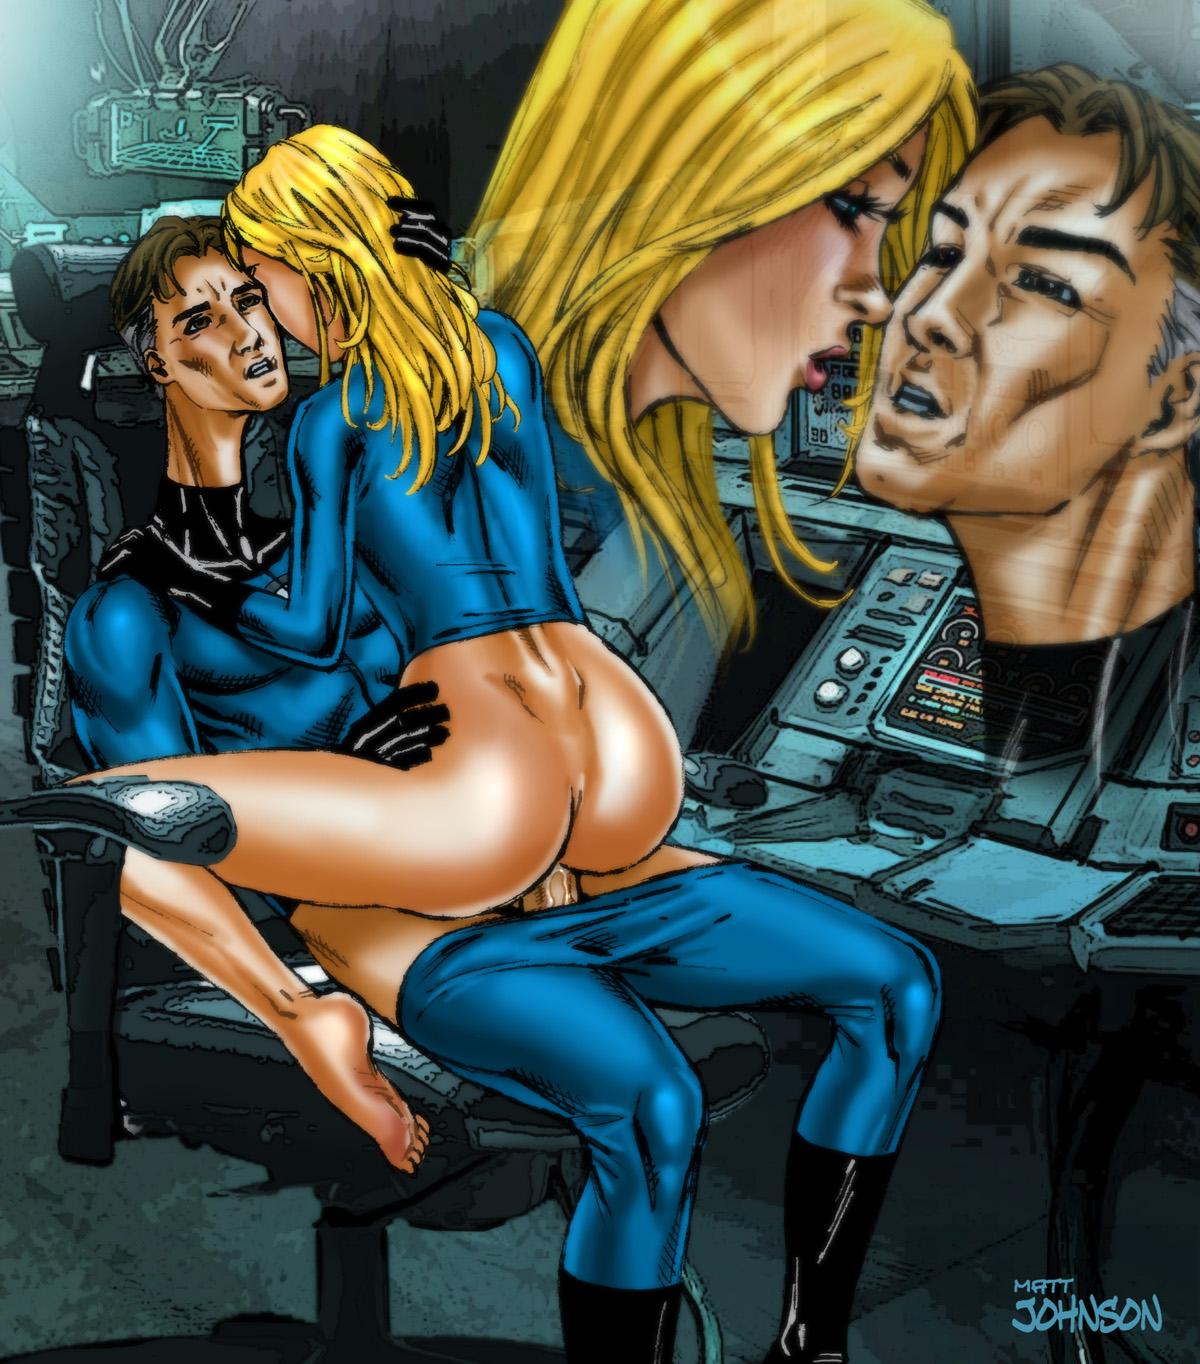 Sexy superheroine comic art matt johnson